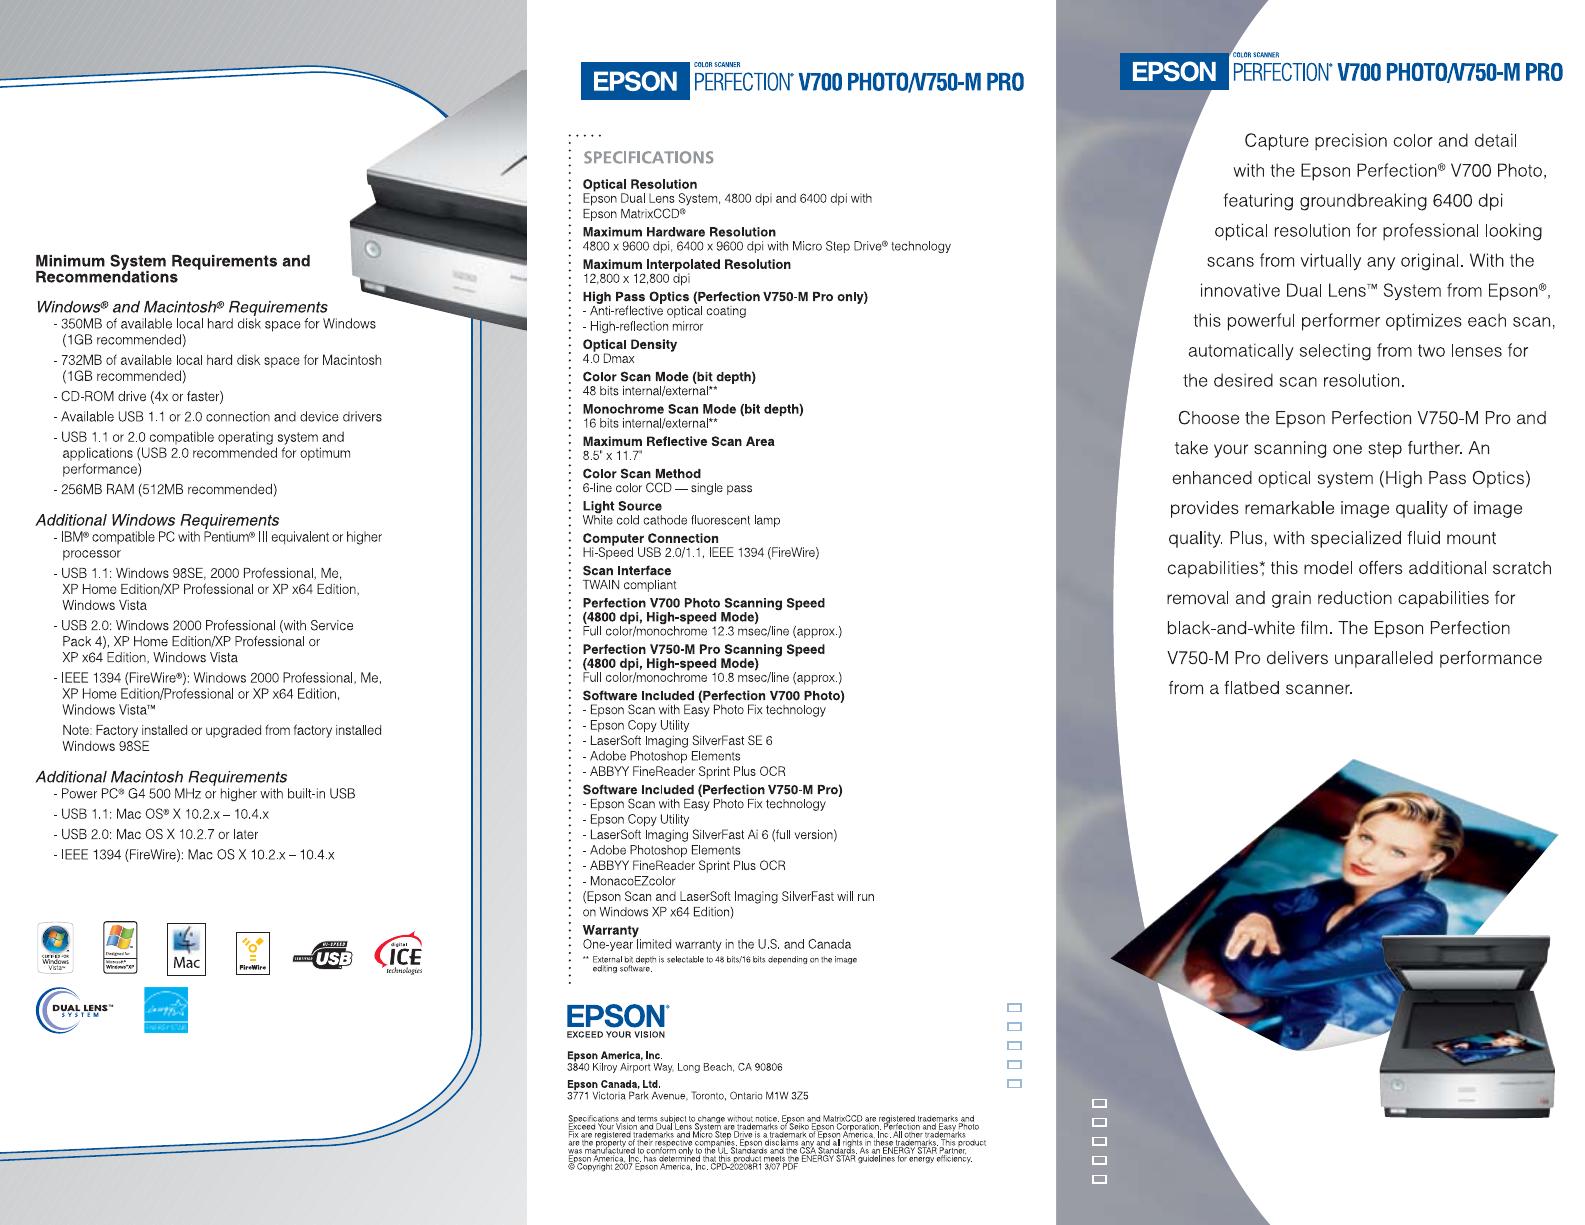 Epson v700 manuals happy array epson v750 m pro users manual v700 v750m insht c20208r1a rh usermanual wiki fandeluxe Gallery